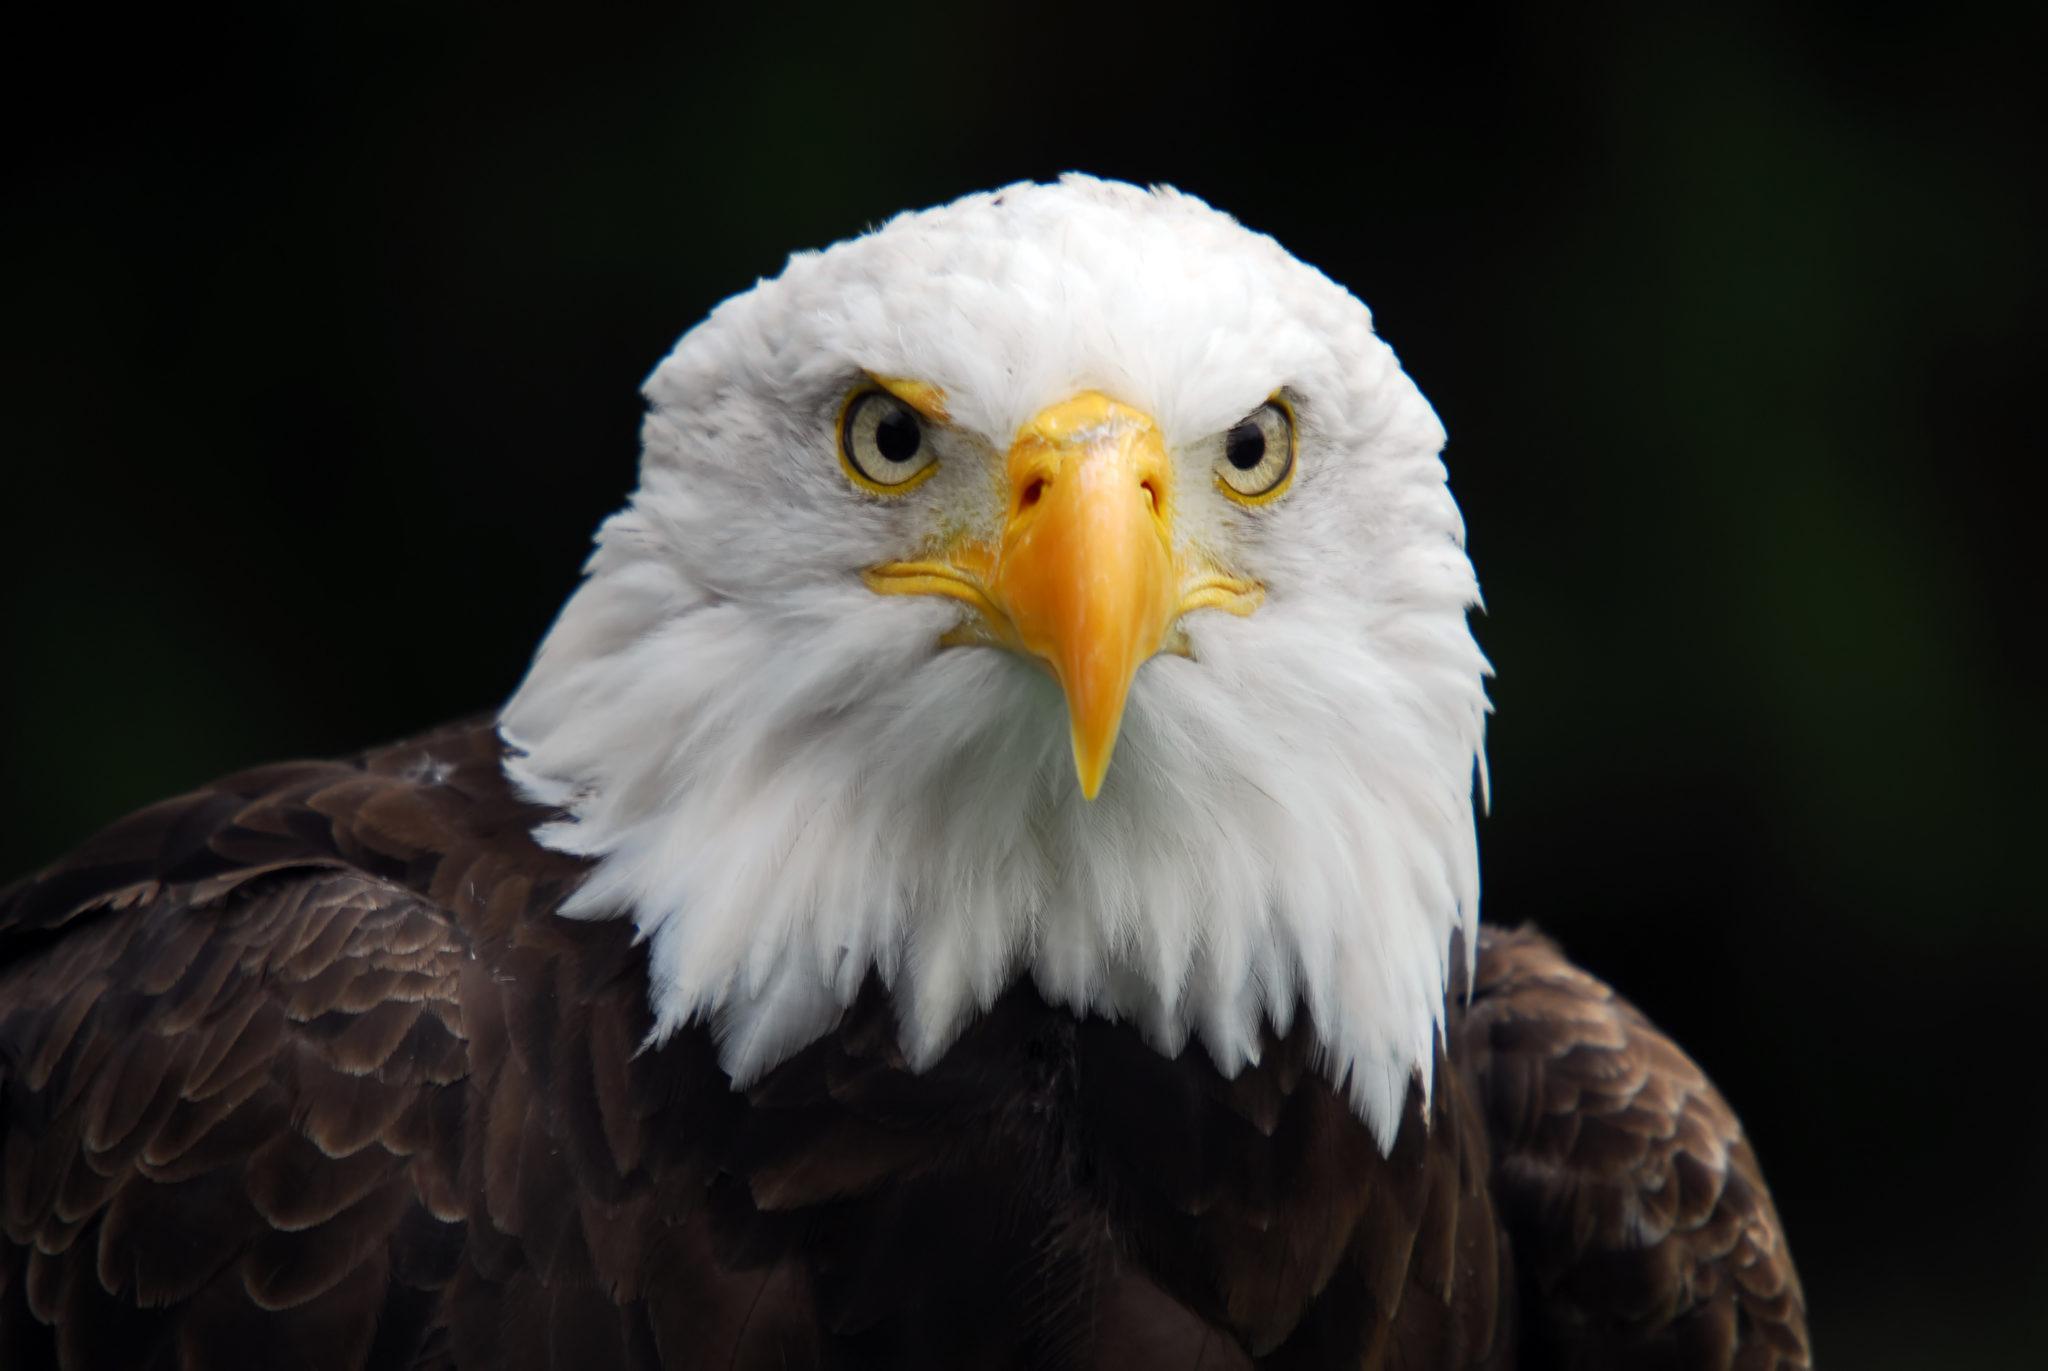 Portrait of an American Bald Eagle (Haliaeetus leucocephalus)